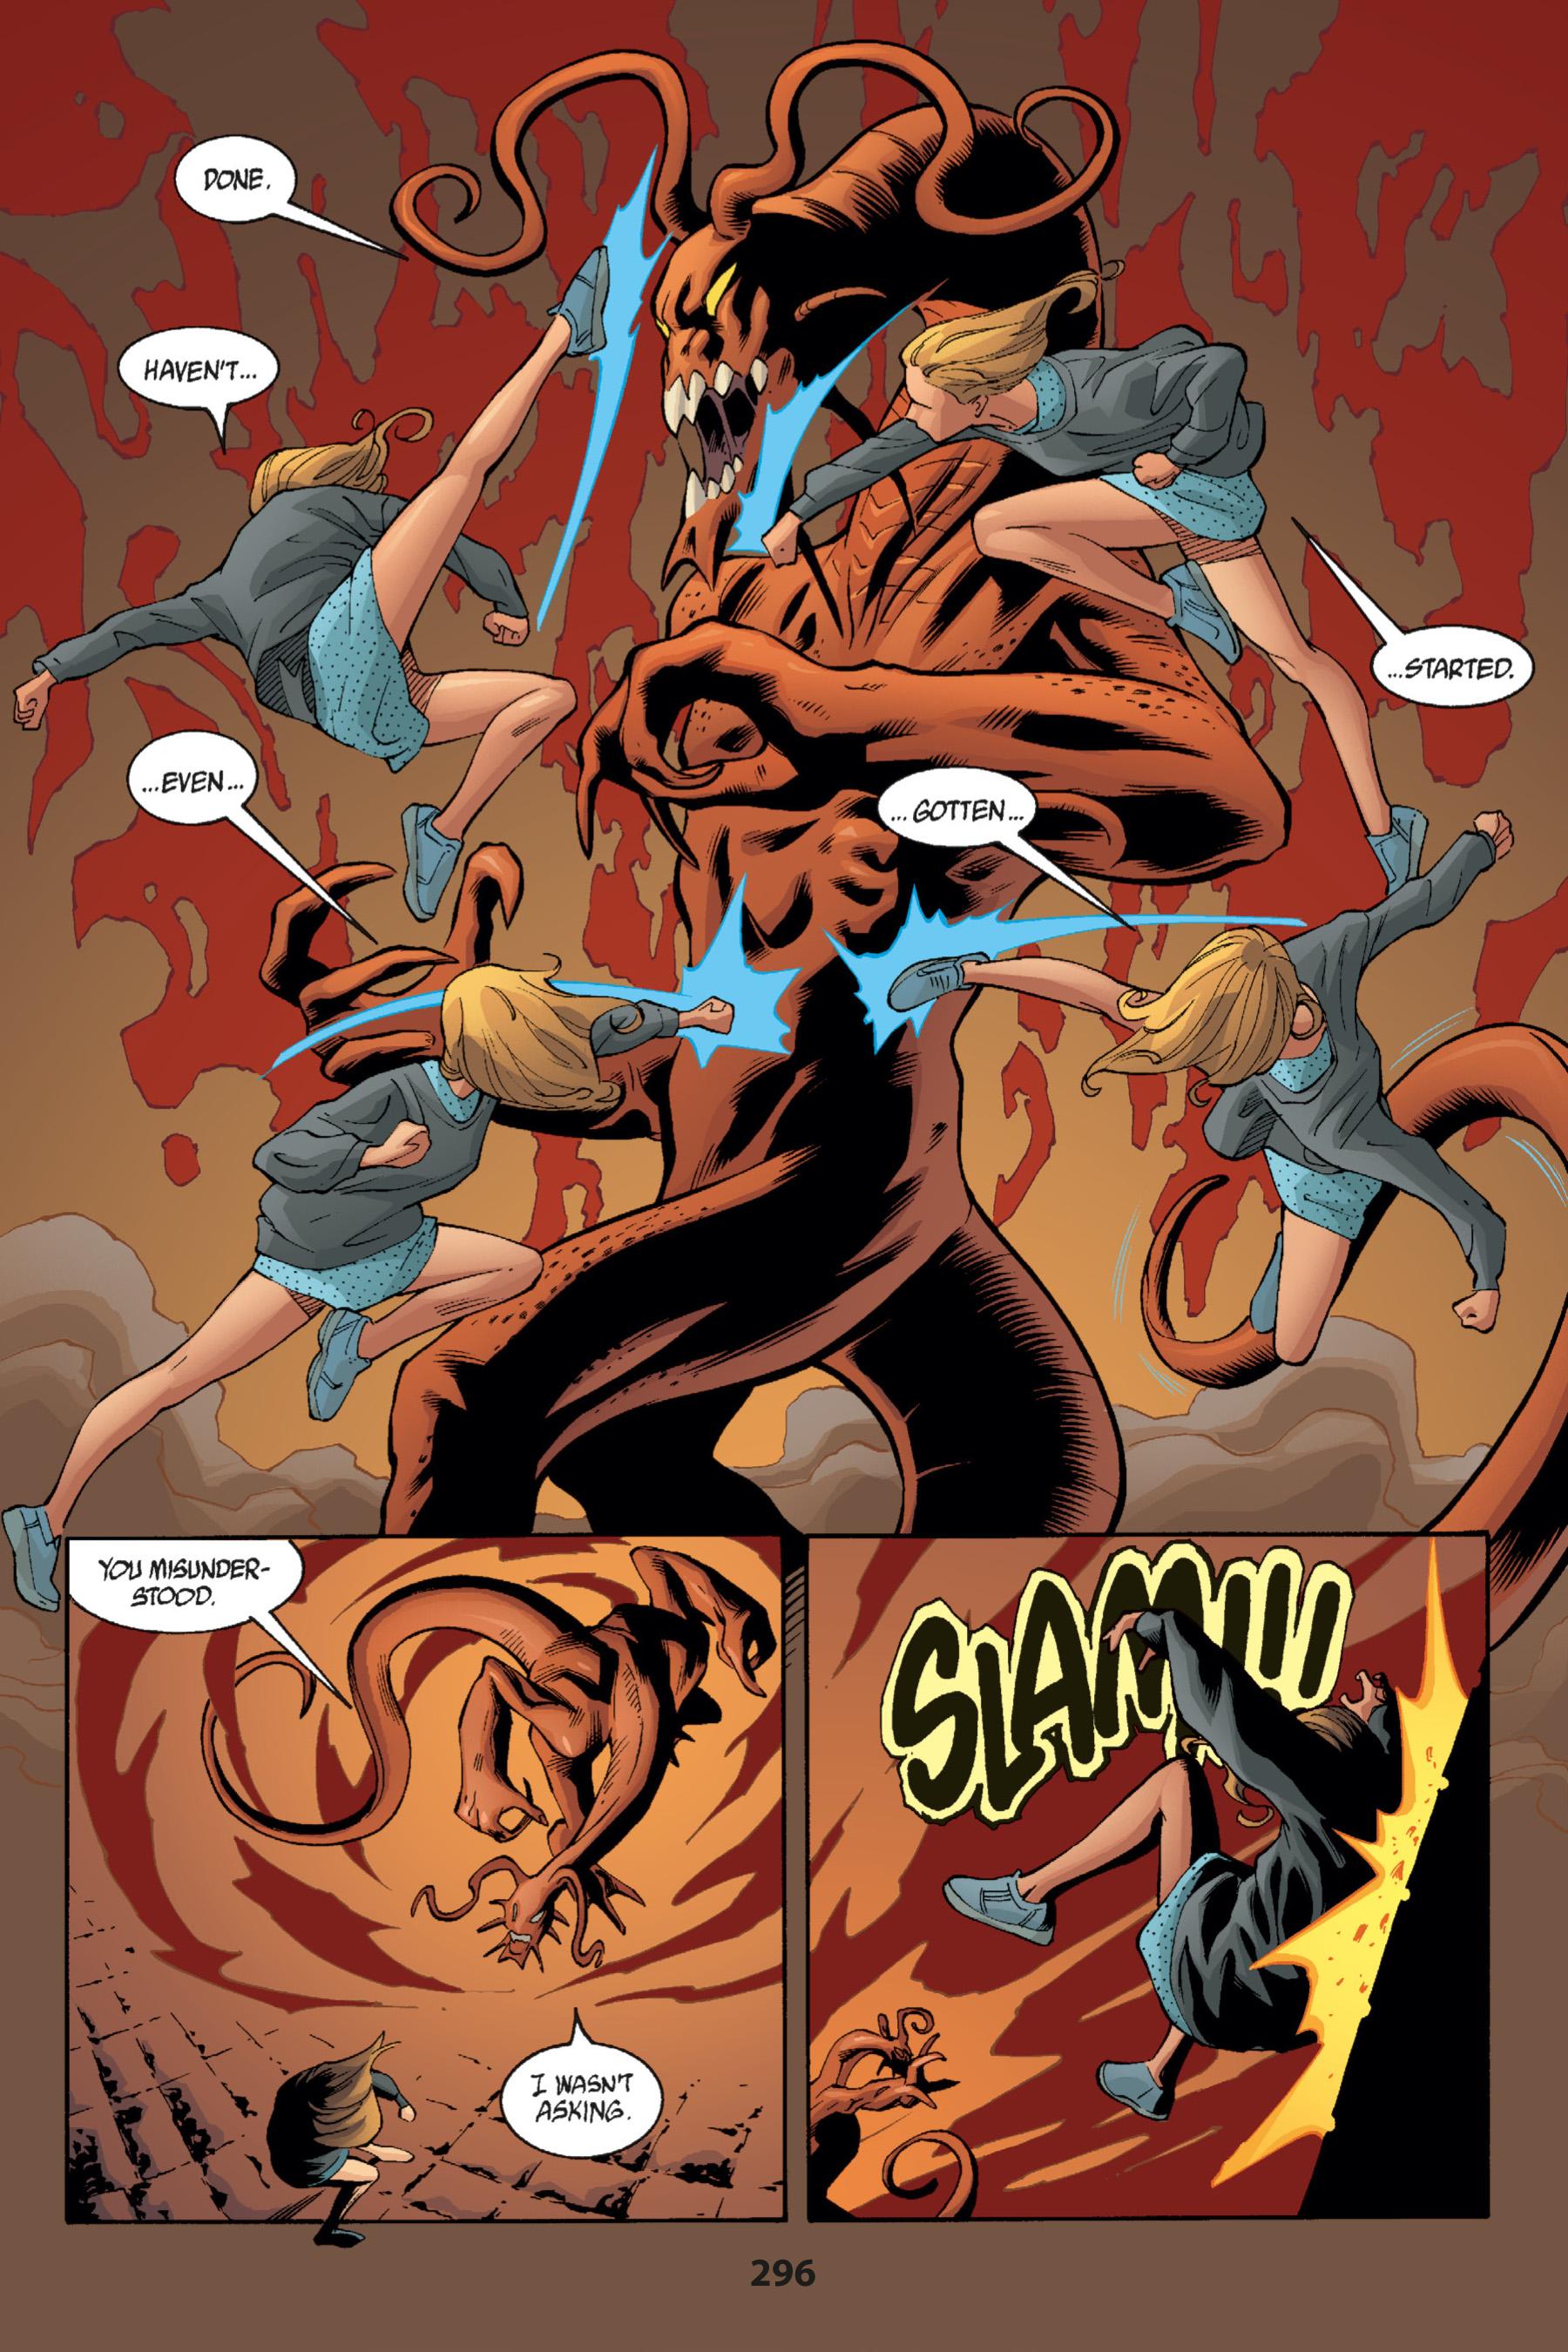 Read online Buffy the Vampire Slayer: Omnibus comic -  Issue # TPB 1 - 284